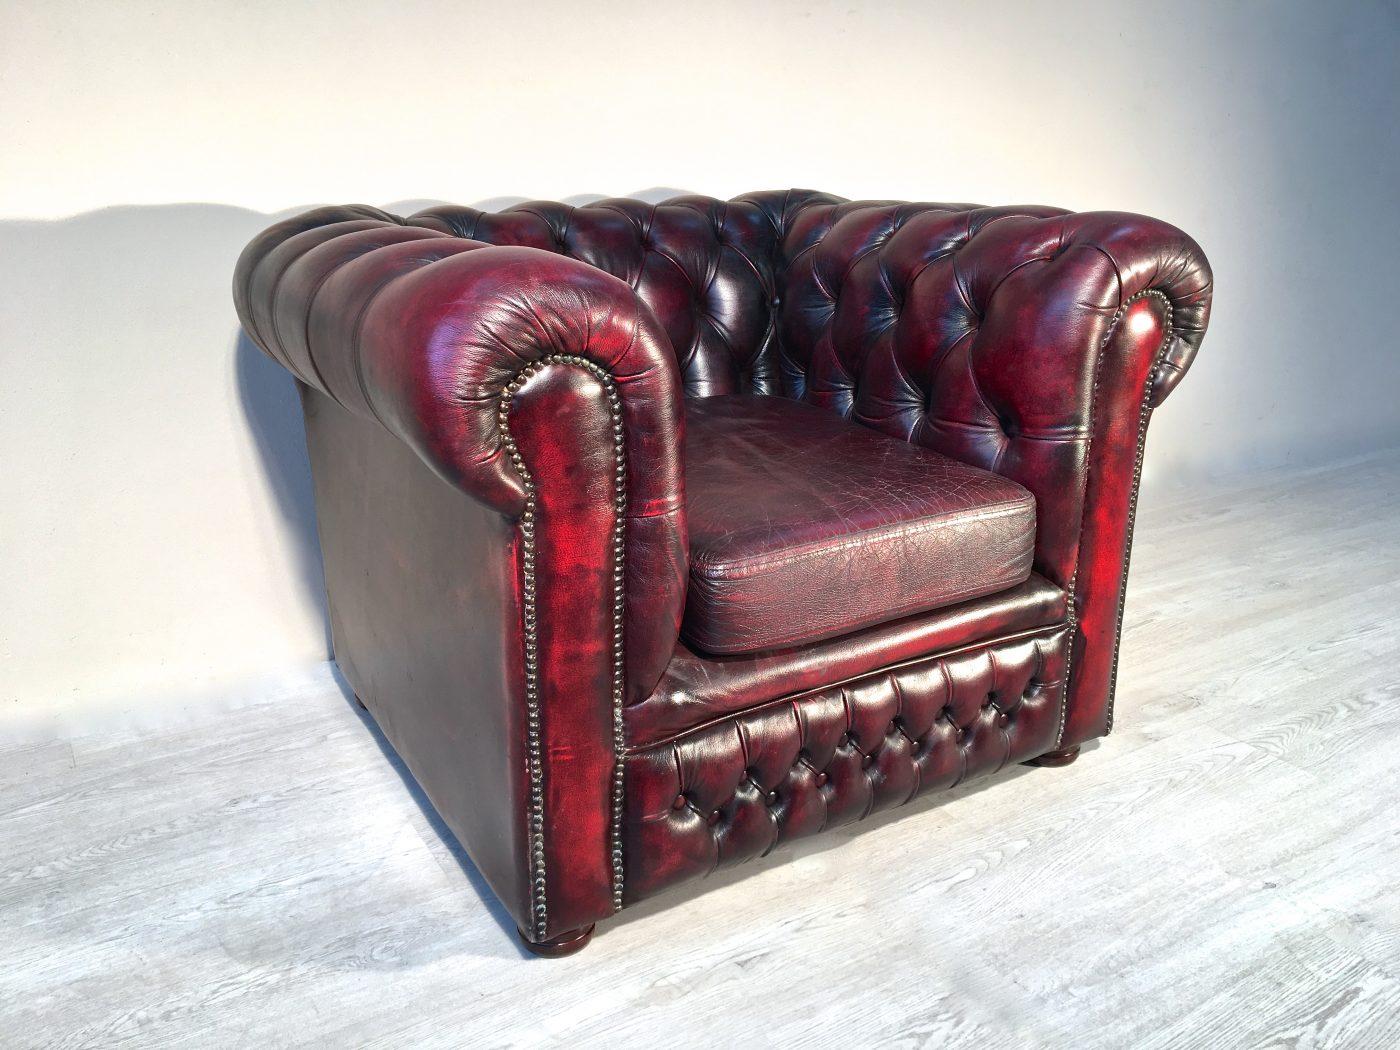 Poltrona chesterfield originale inglese in pelle divani - Poltrone in pelle chesterfield ...